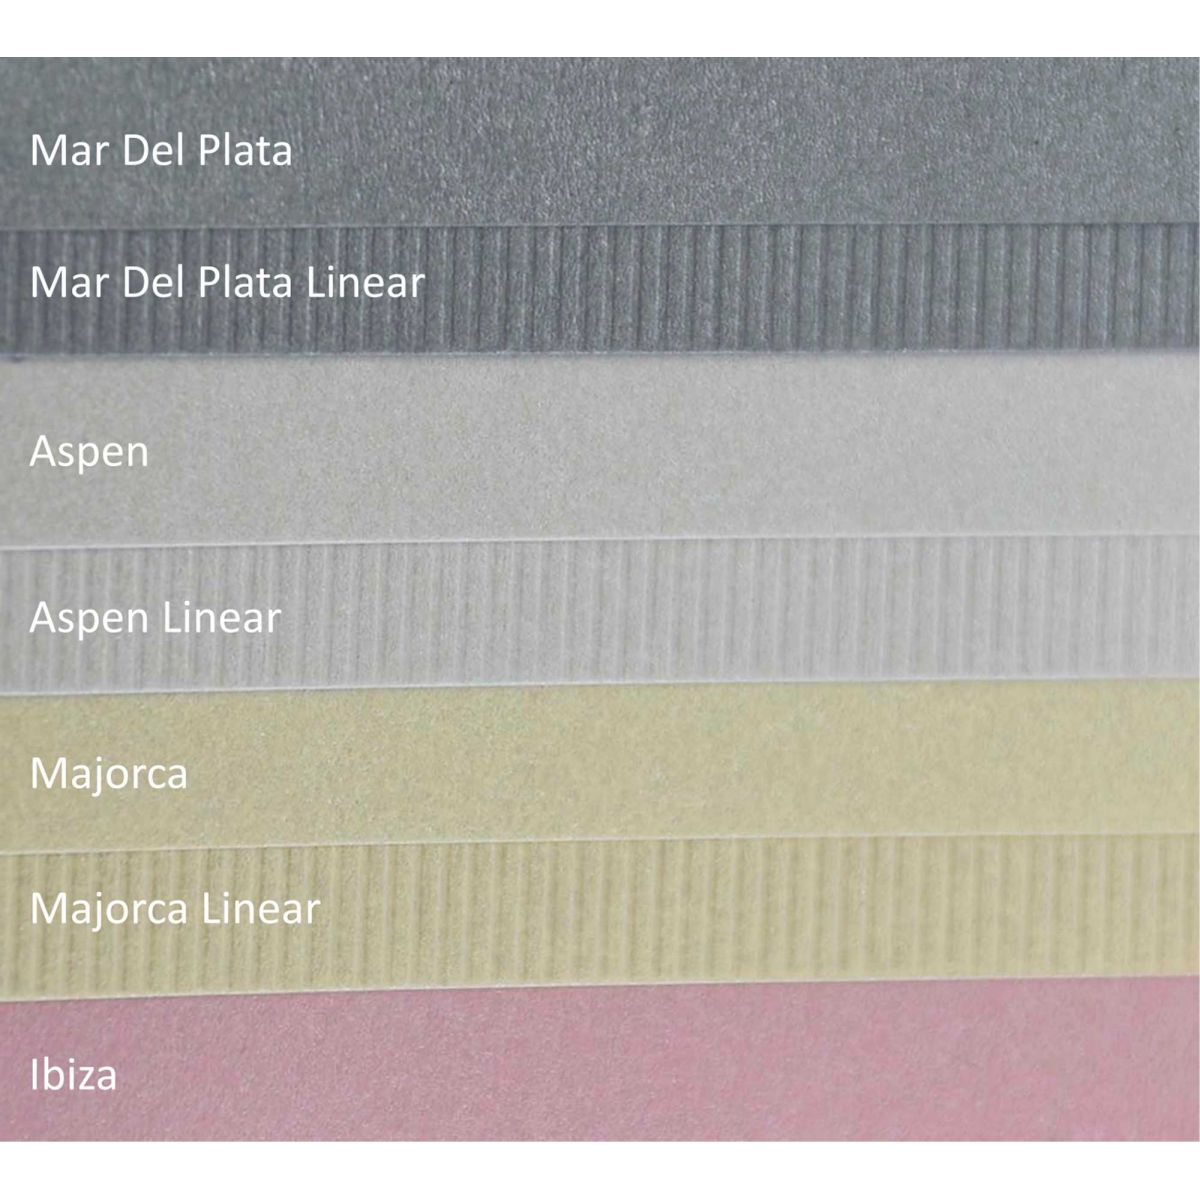 Color Plus Metálico Mar del Plata Linear - 250g